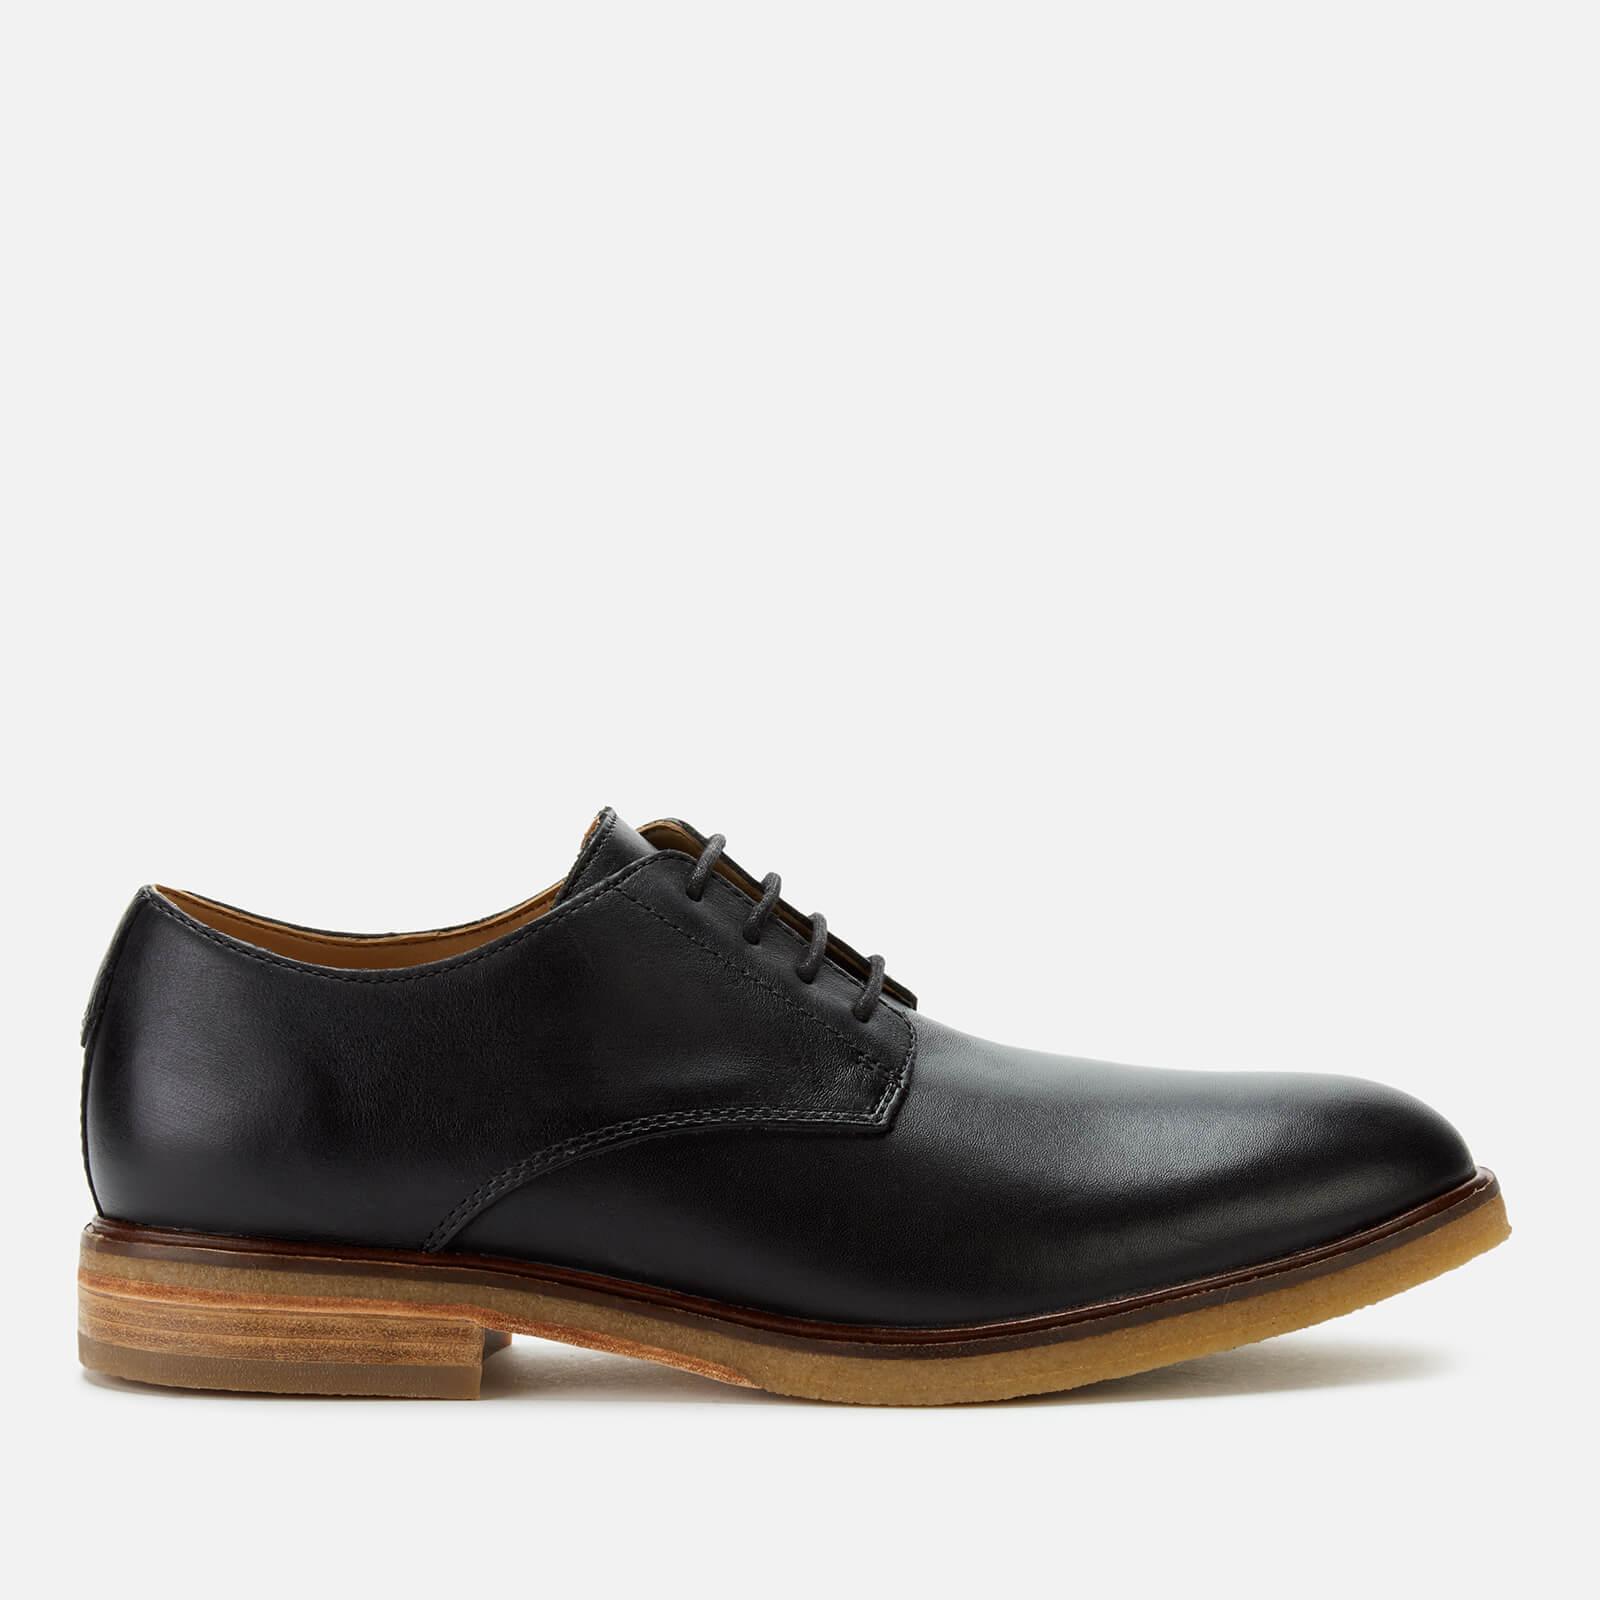 Clarks Men's Clarkdale Moon Leather Derby Shoes - Black - UK 11